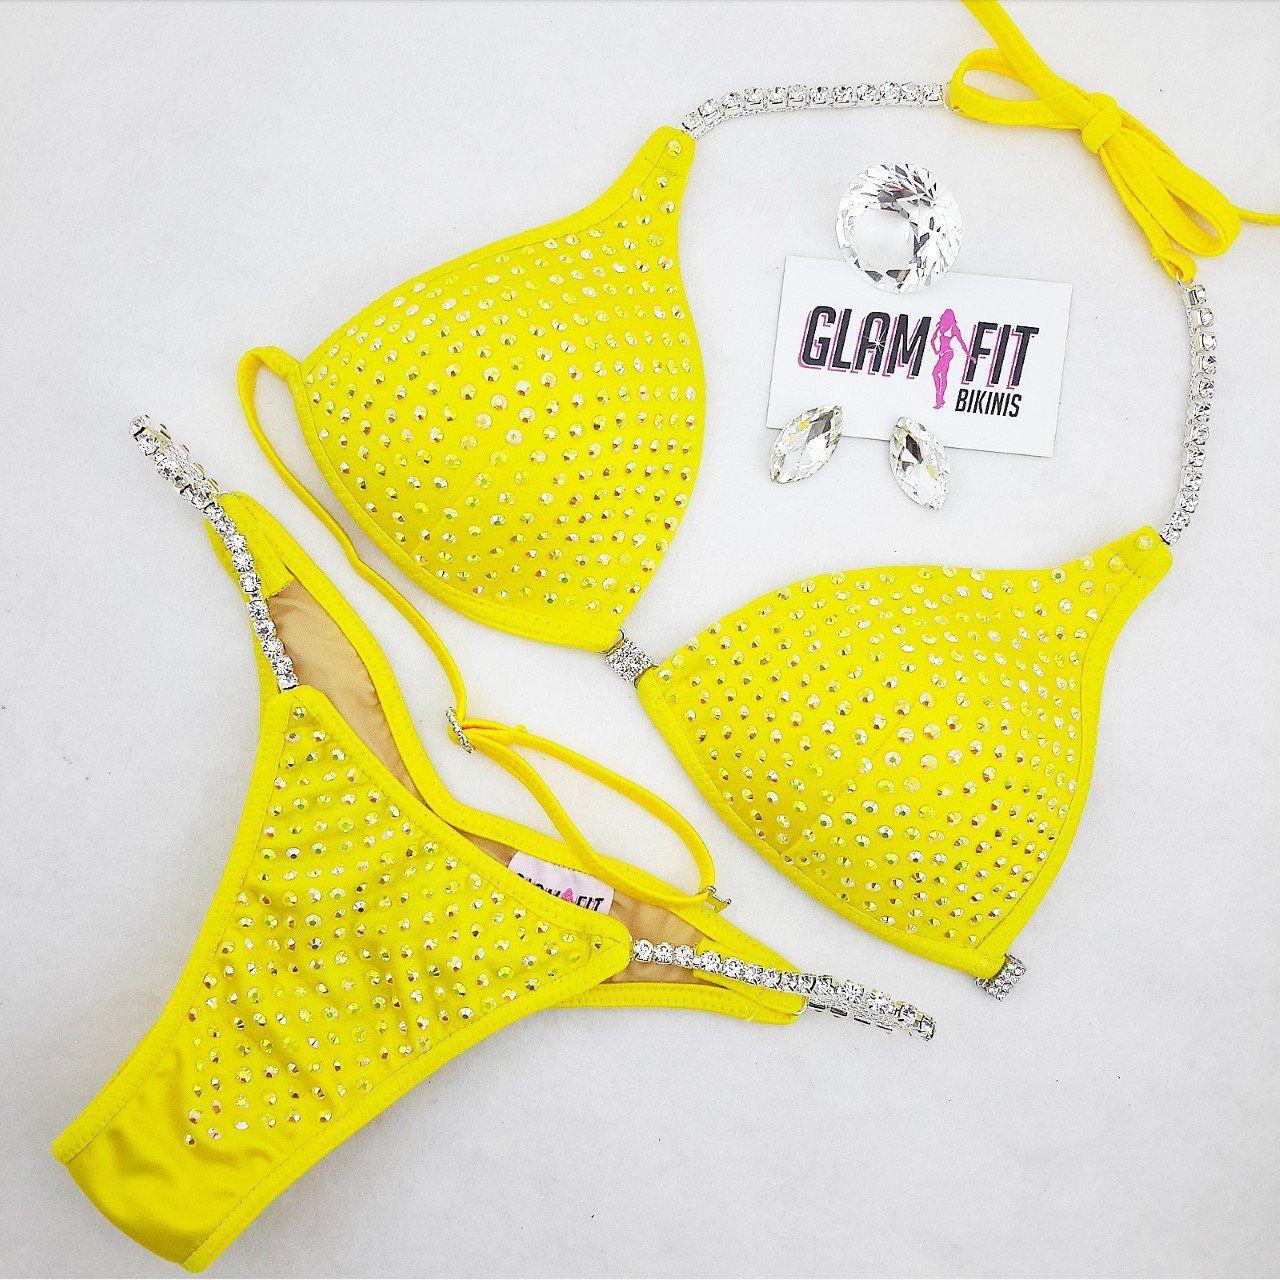 9d768d5c7cd95 Tropicana Glam Queen Sweetheart Bikinis For Sale, Bikini Workout, String  Bikinis, G Strings